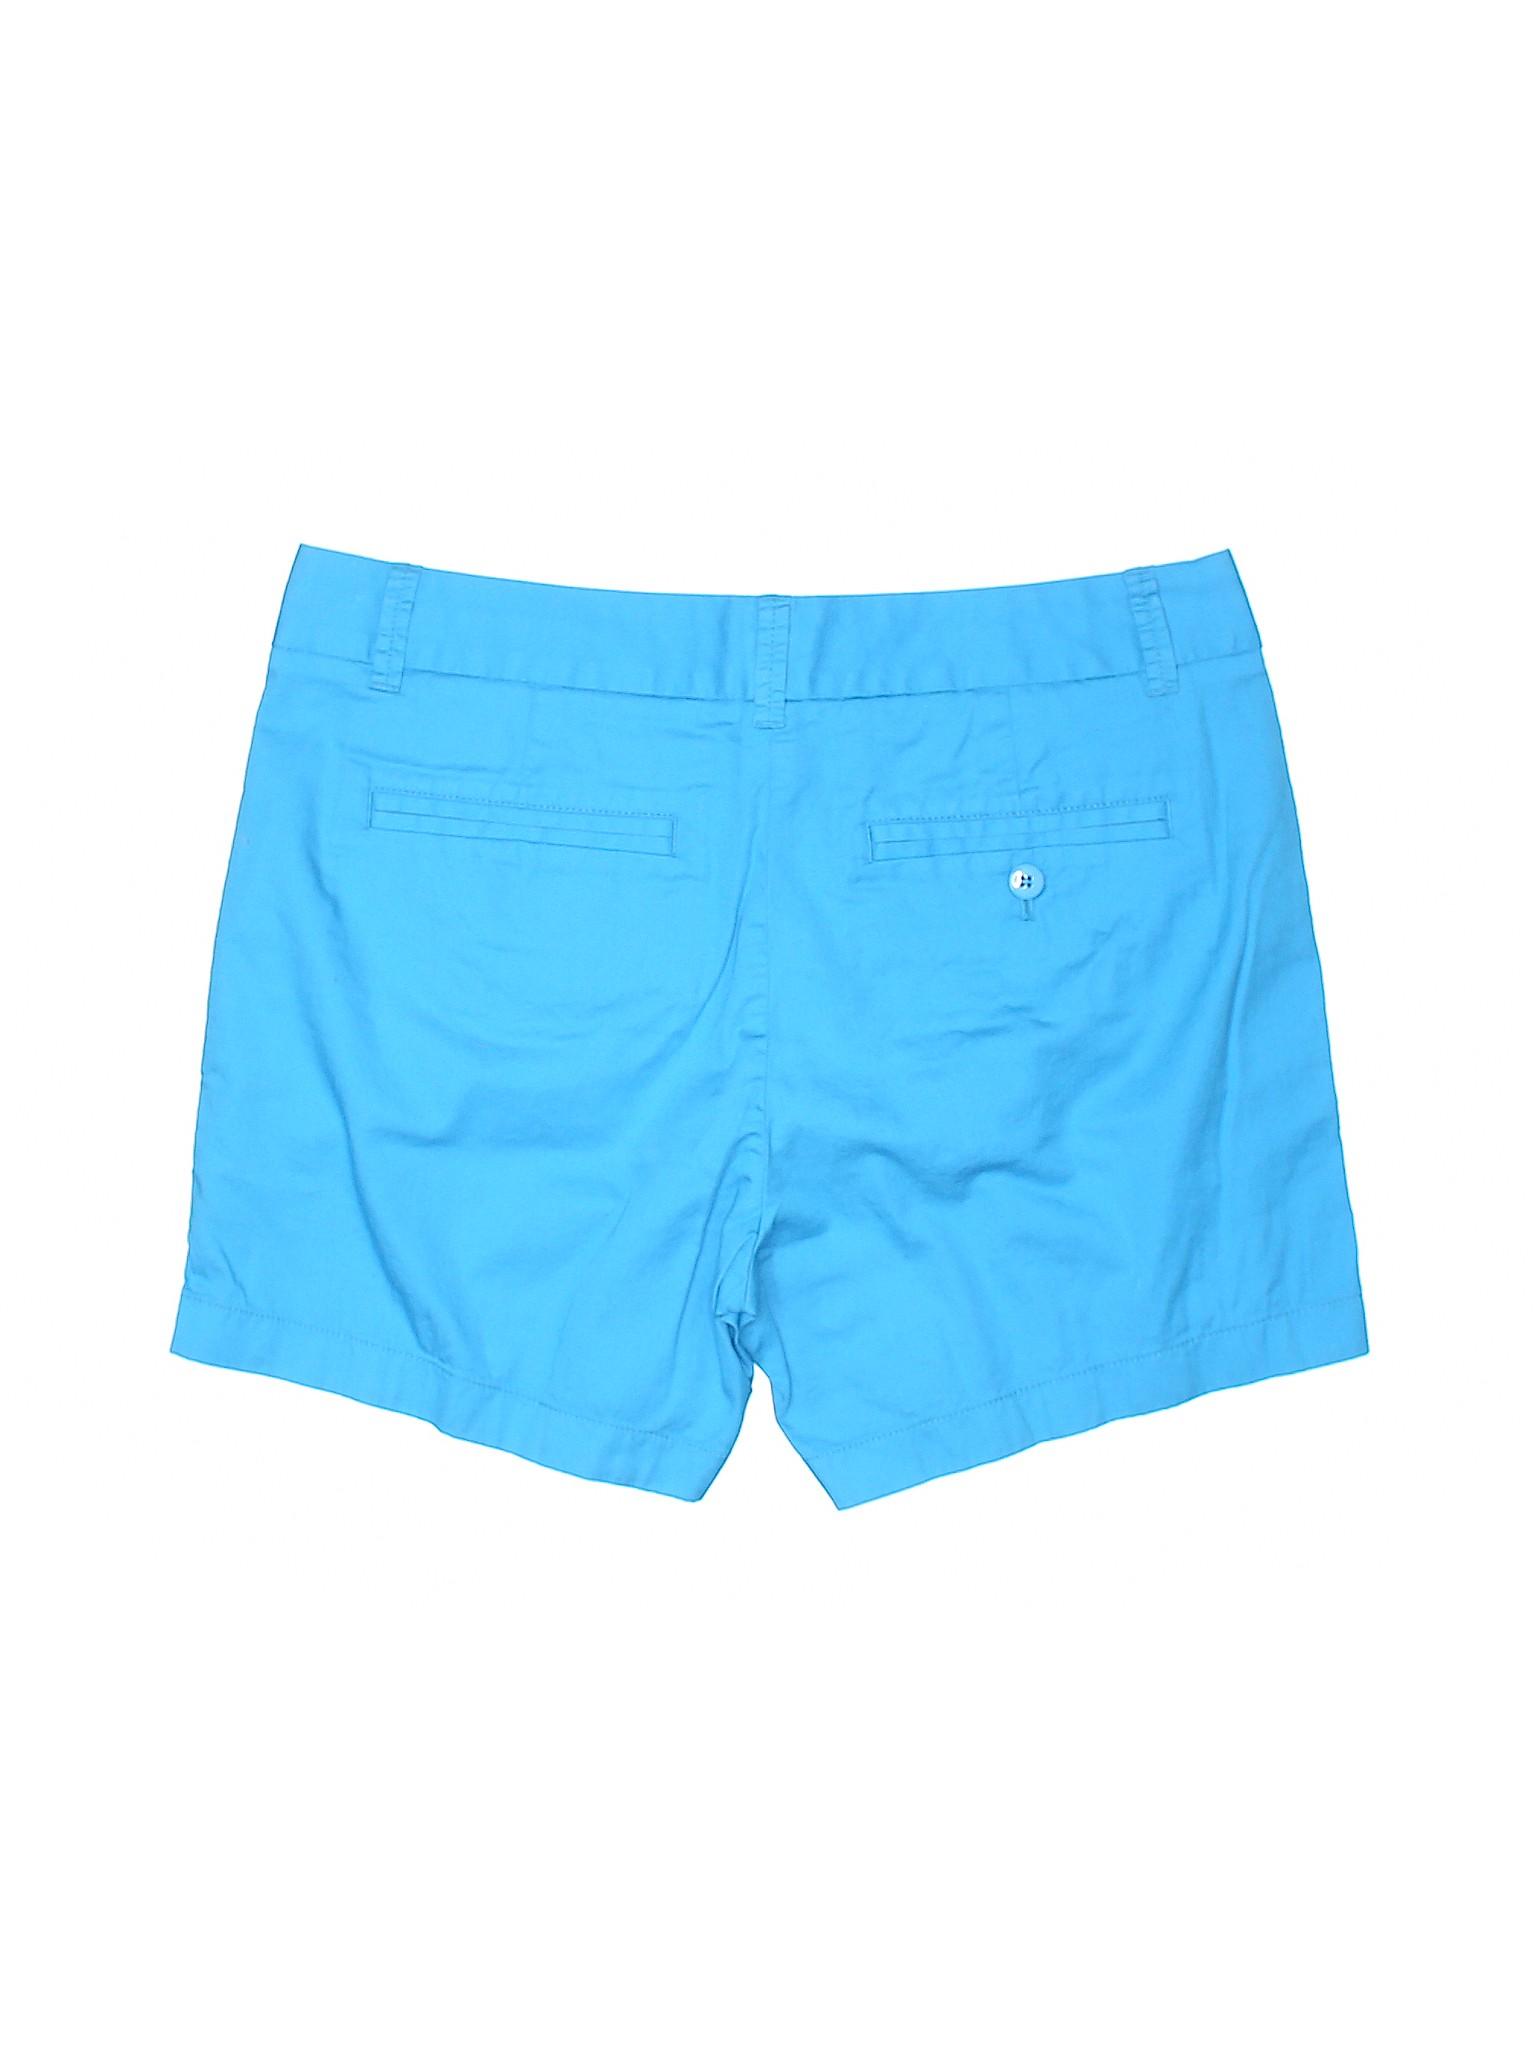 Shorts J winter Khaki Store Crew Leisure Factory wz7OxRnq